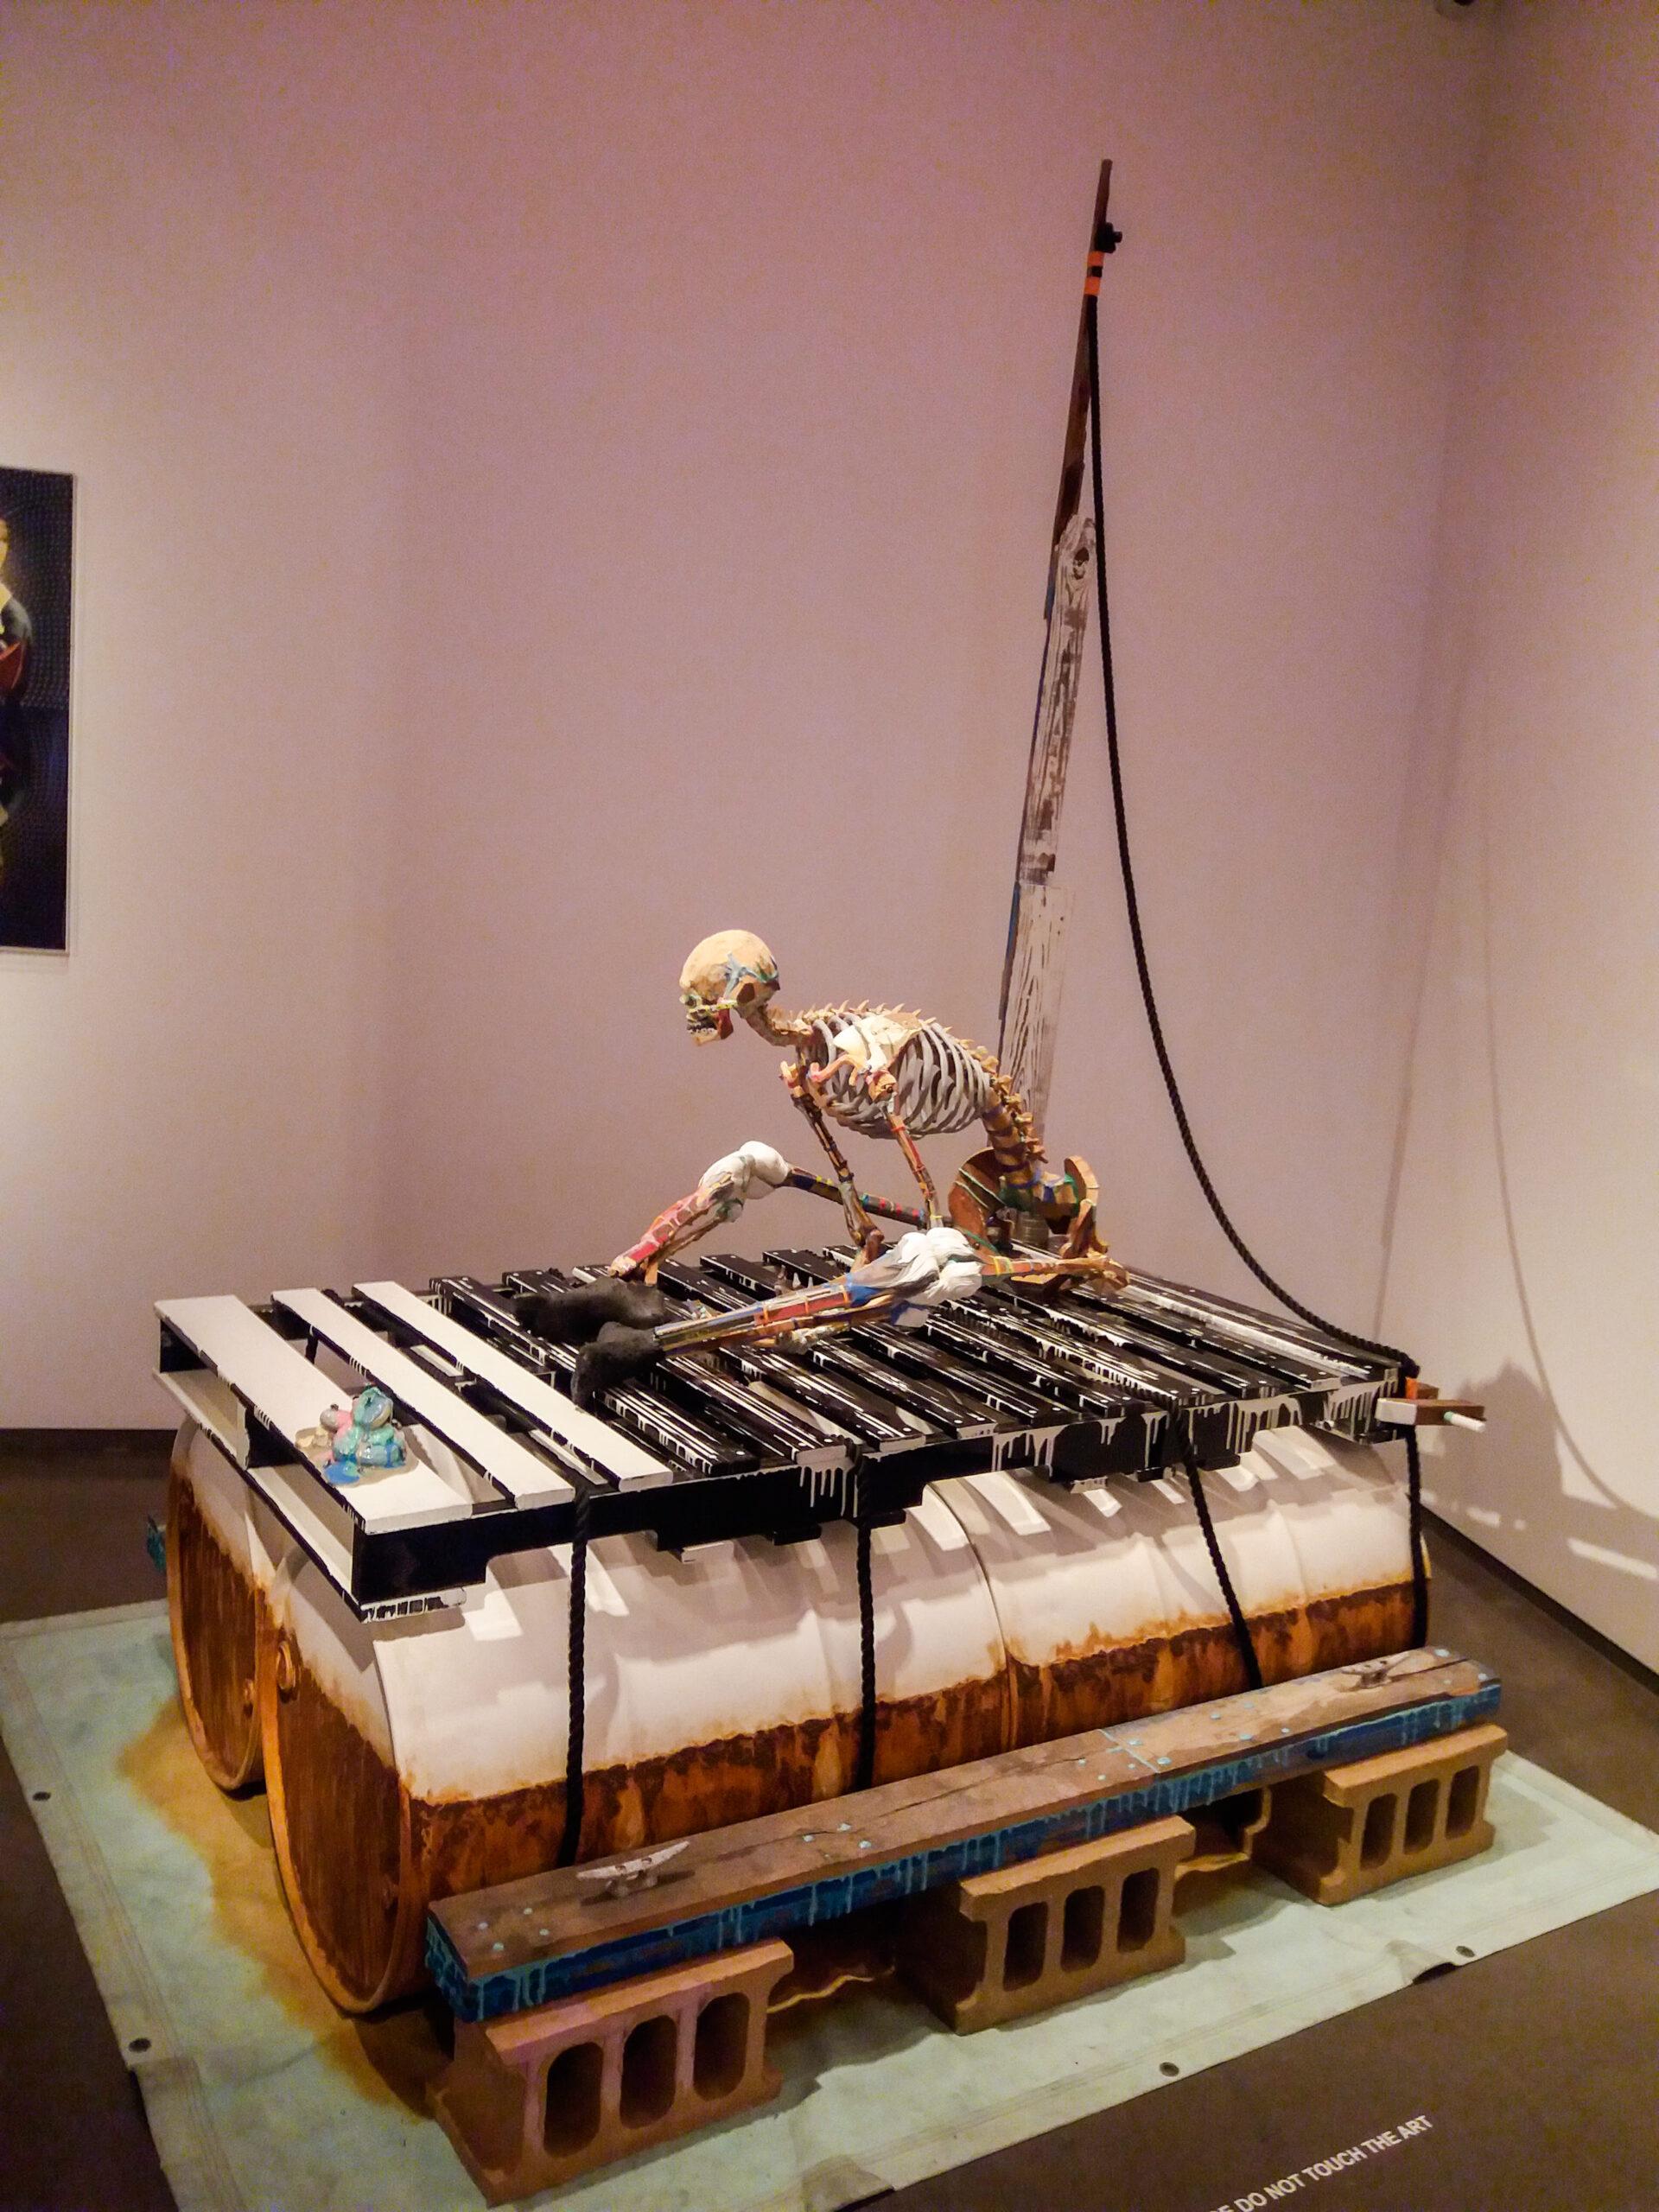 21c art exhibit